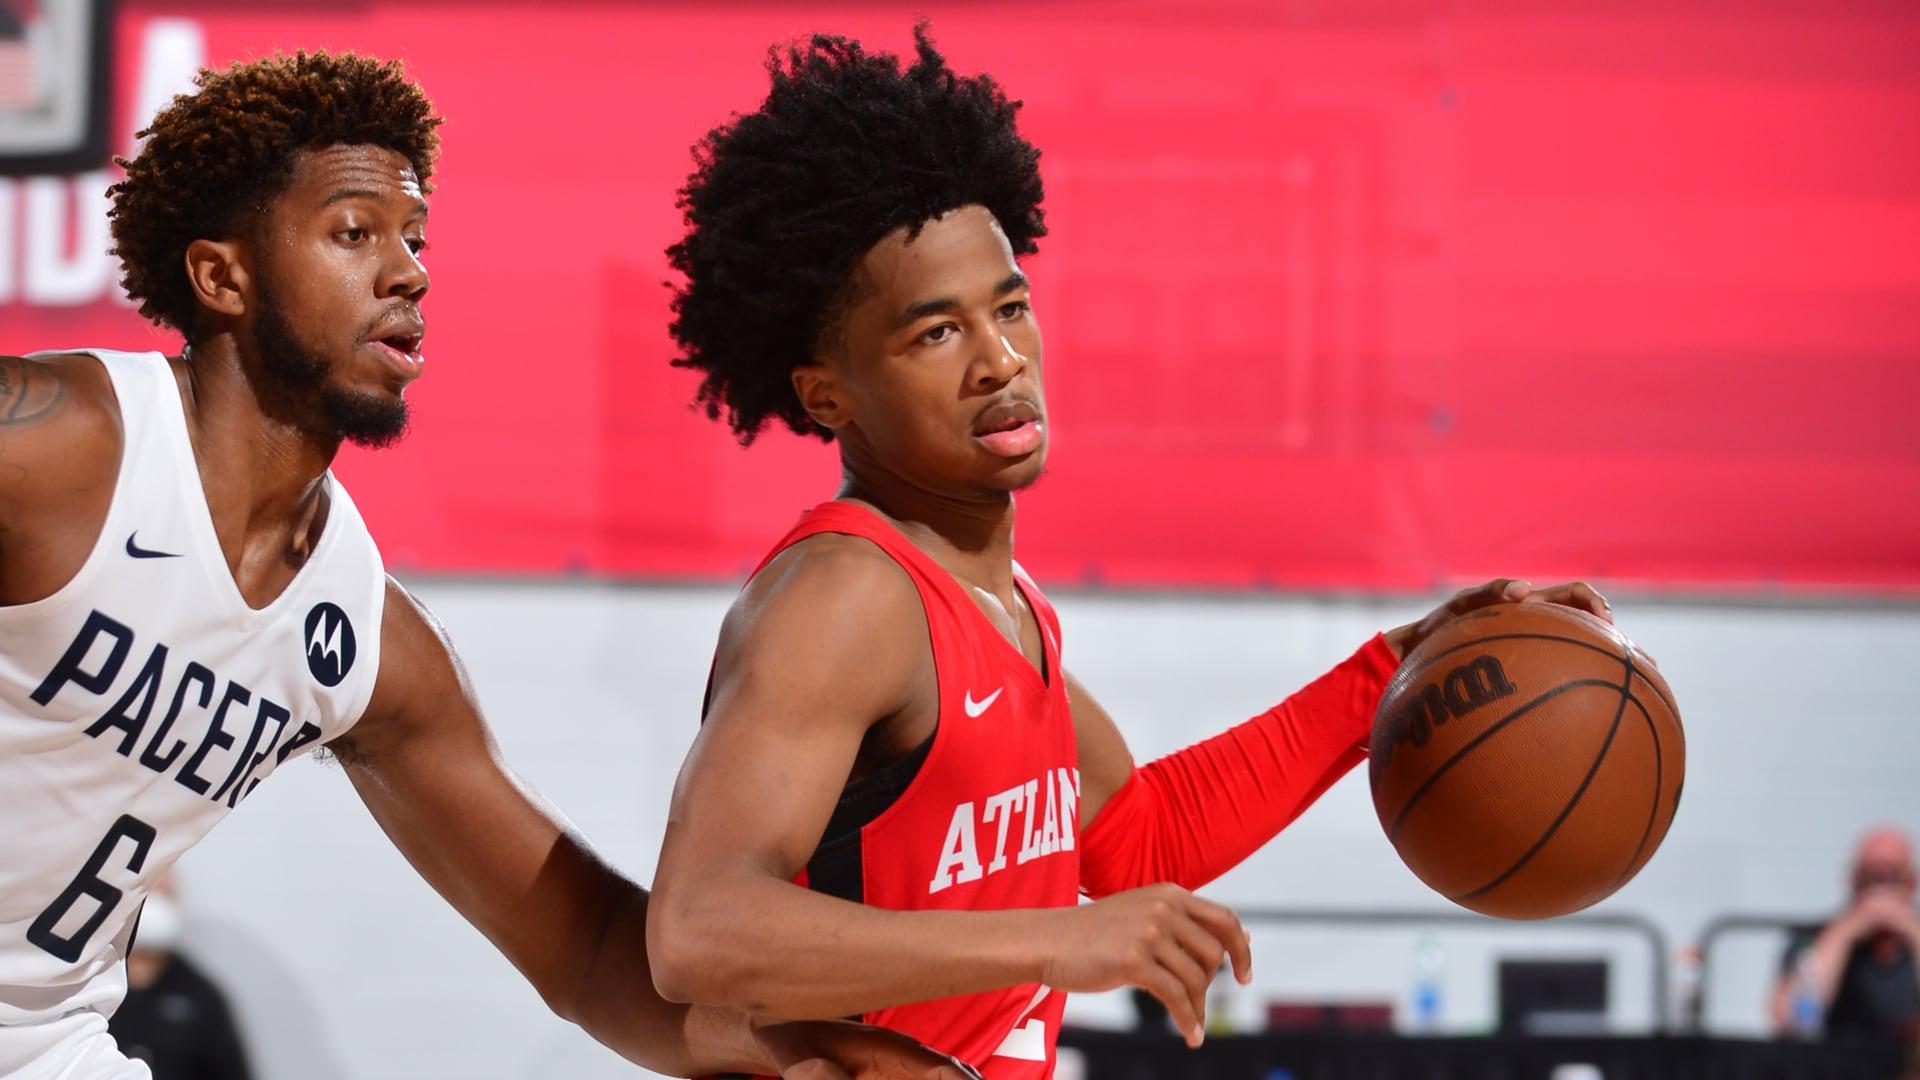 Game Recap: Hawks 84, Pacers 83